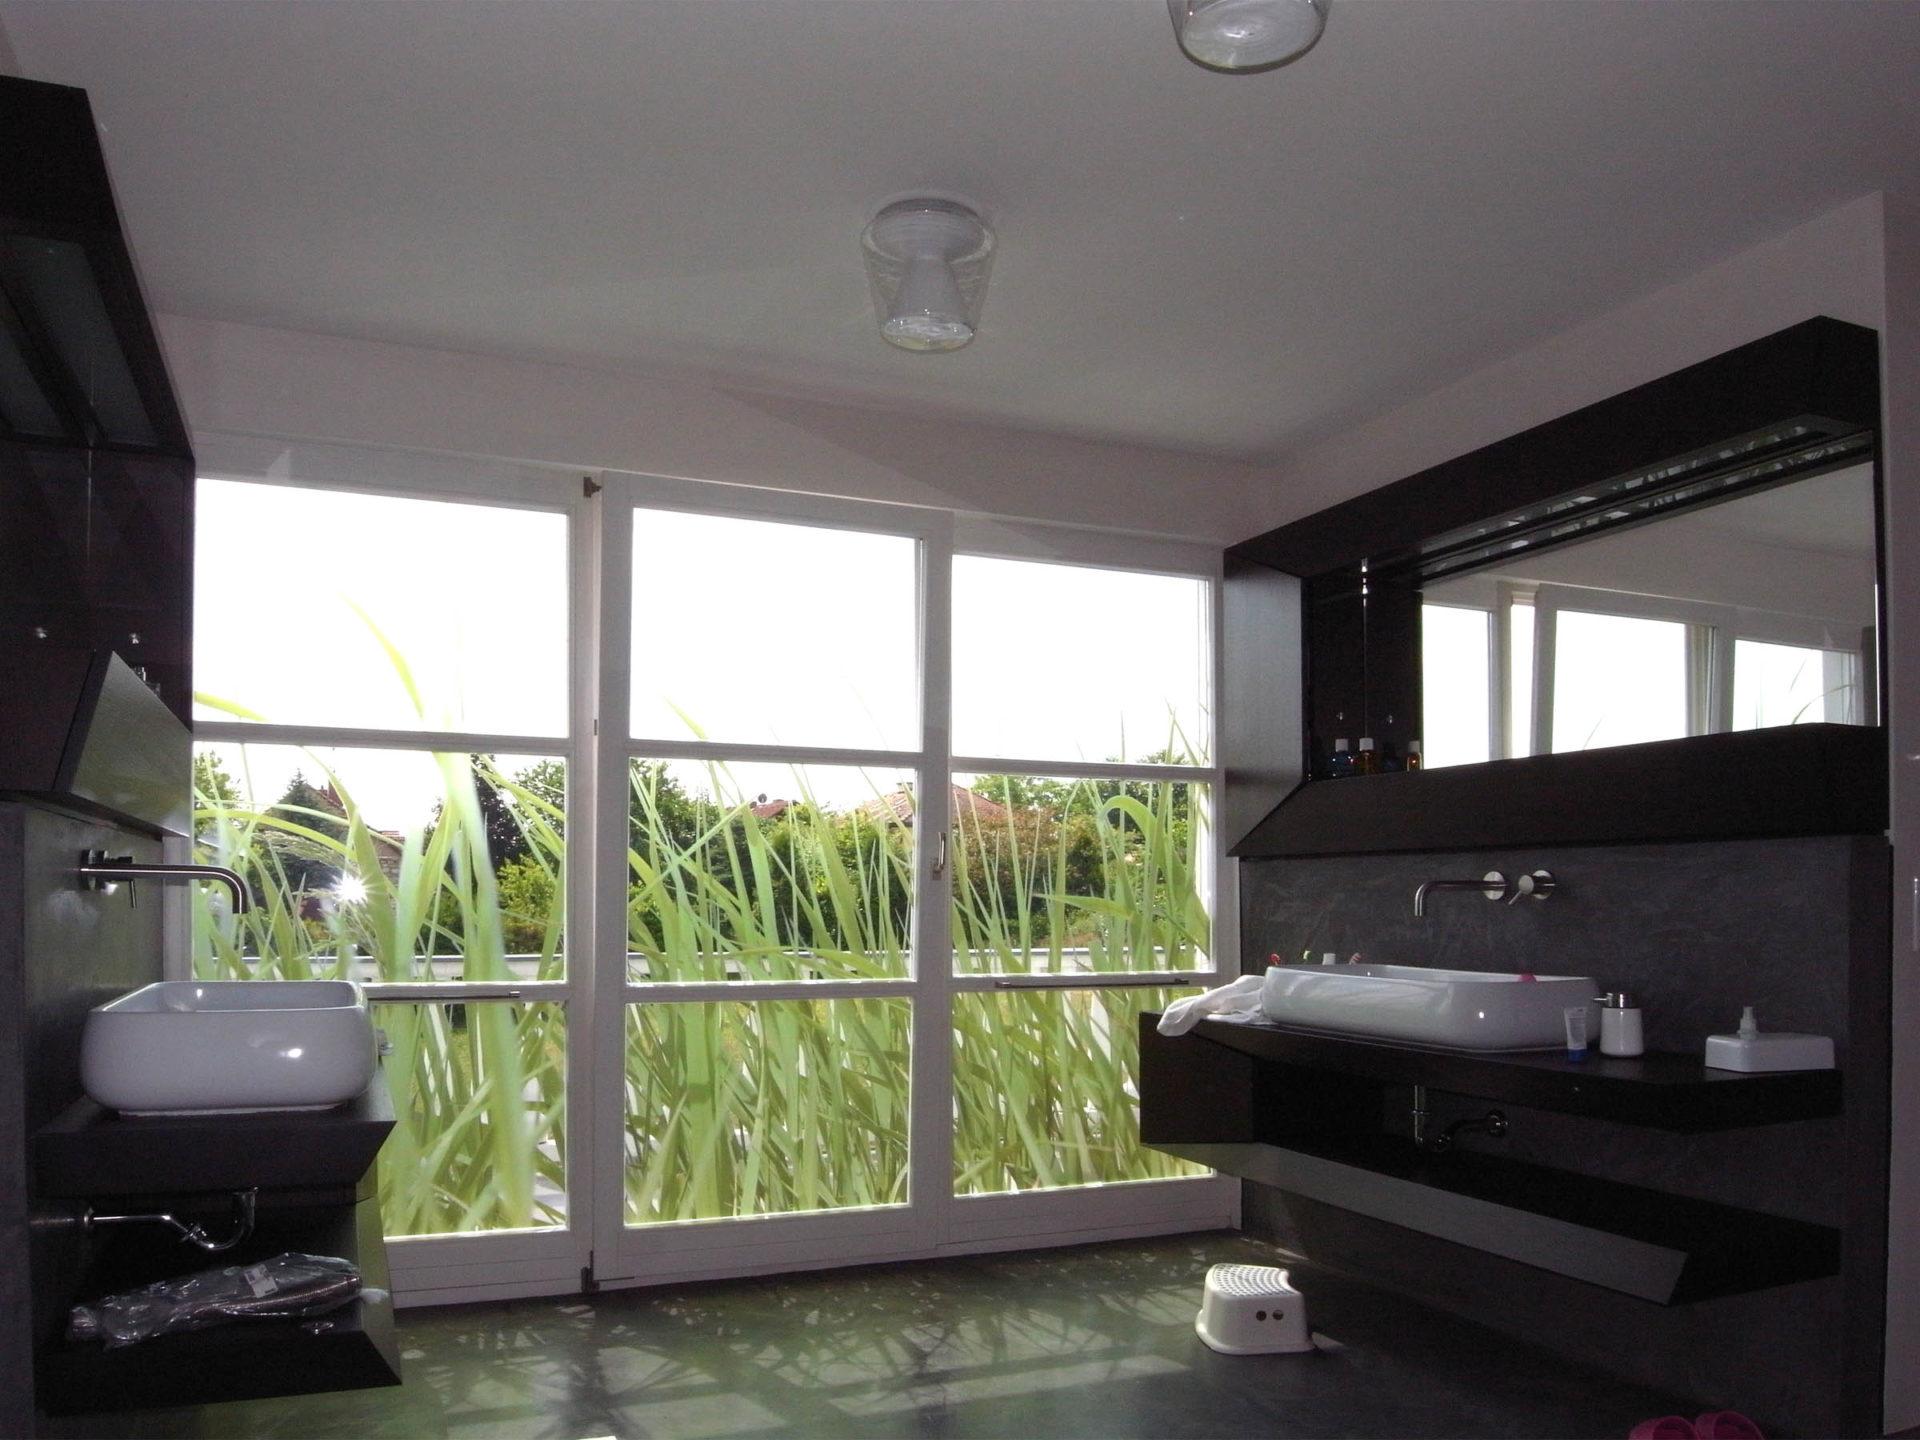 einfamilienhaus kitzingen andreas br derle architekt. Black Bedroom Furniture Sets. Home Design Ideas